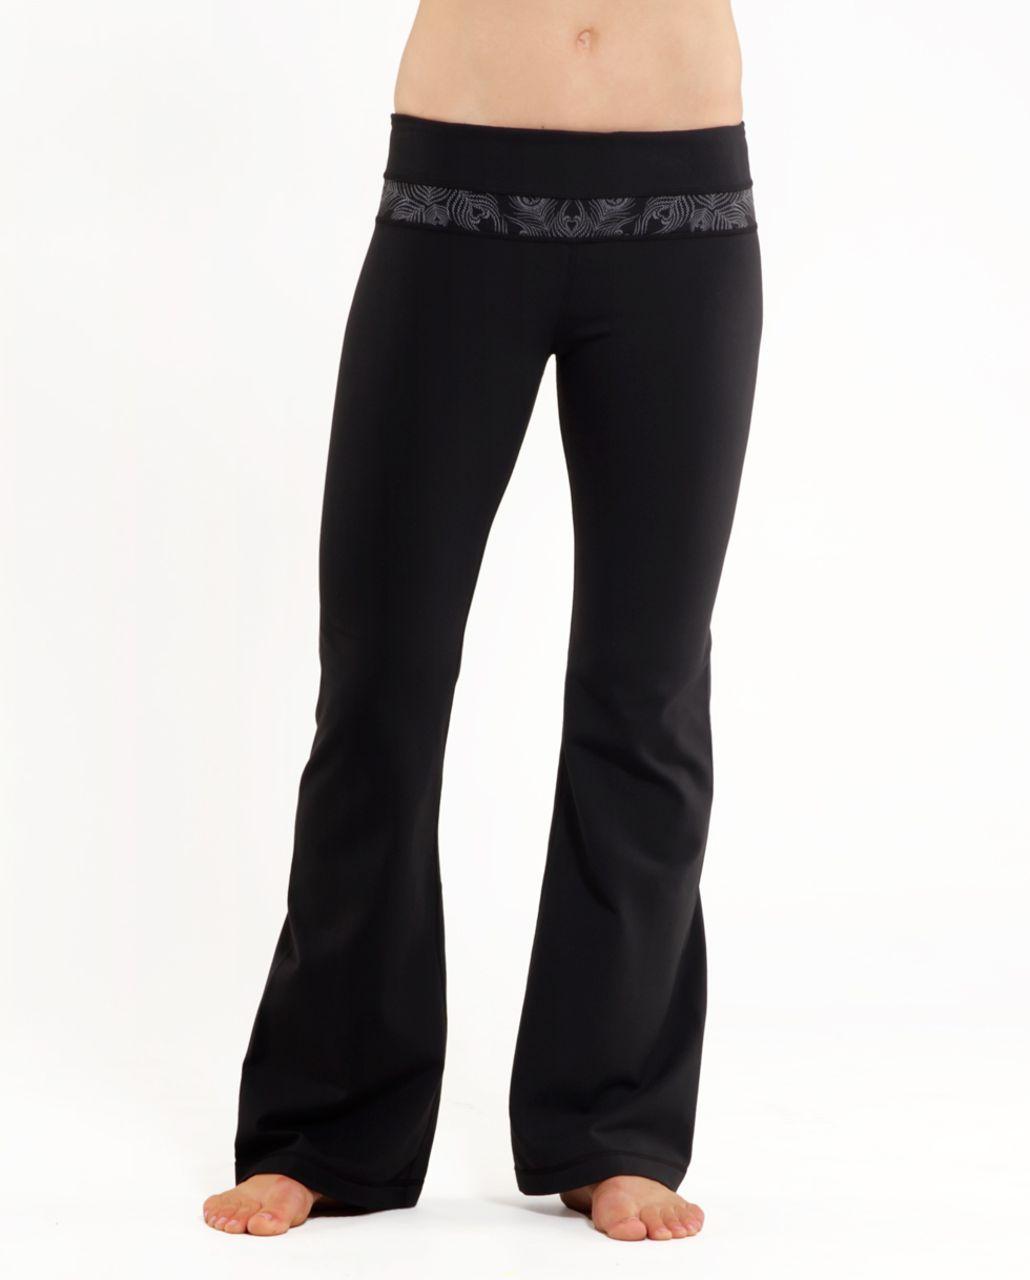 Lululemon Groove Pant (Regular) - Black /  Silver Peacock Lace Reflective /  Black Space Dye